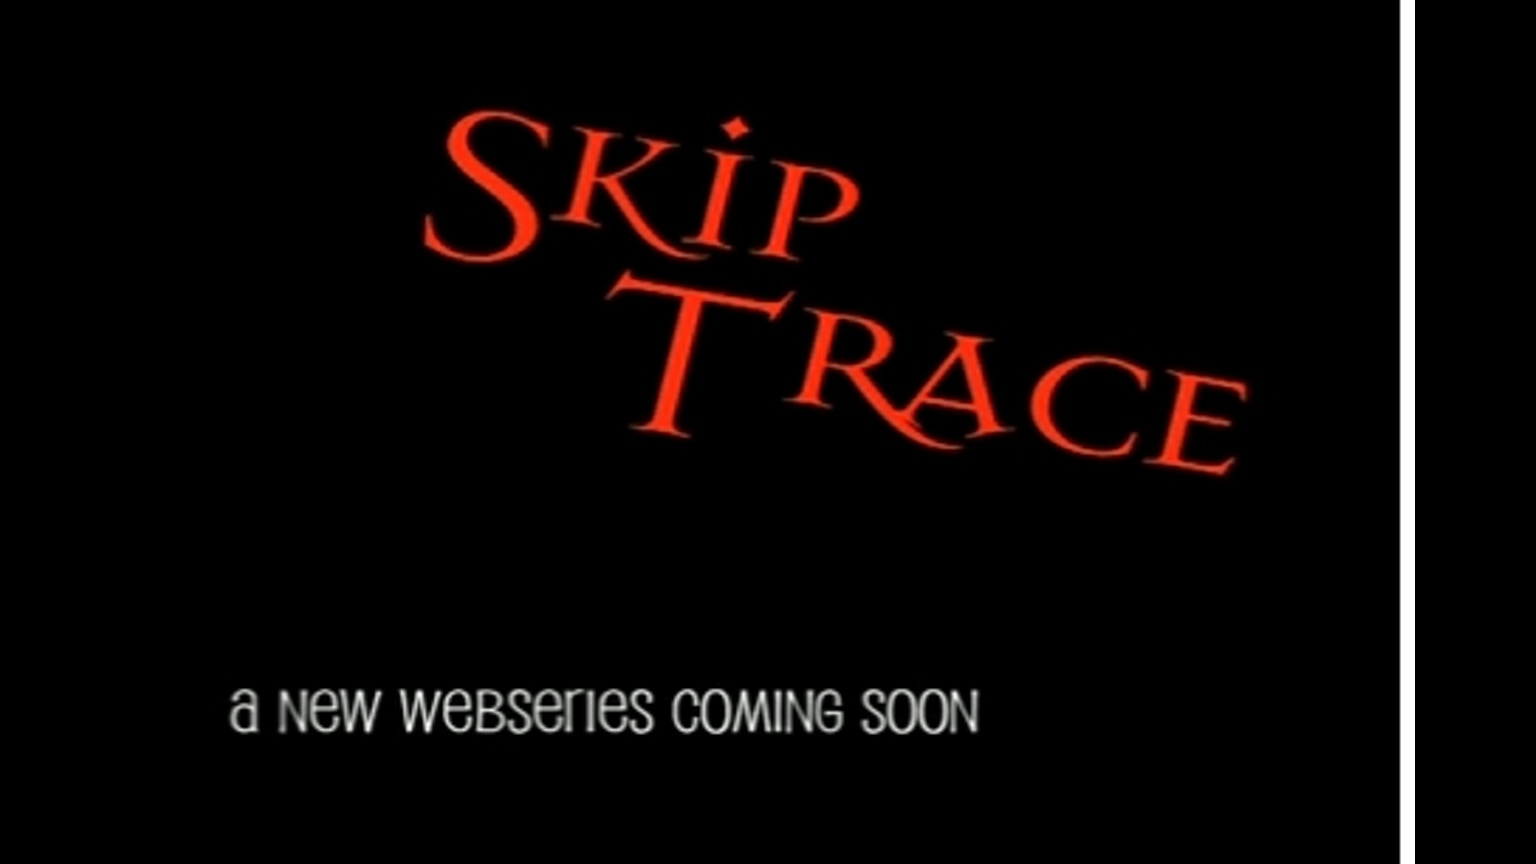 skip trace hot bounty hunters bad guys free tv by geek goddess kickstarter. Black Bedroom Furniture Sets. Home Design Ideas